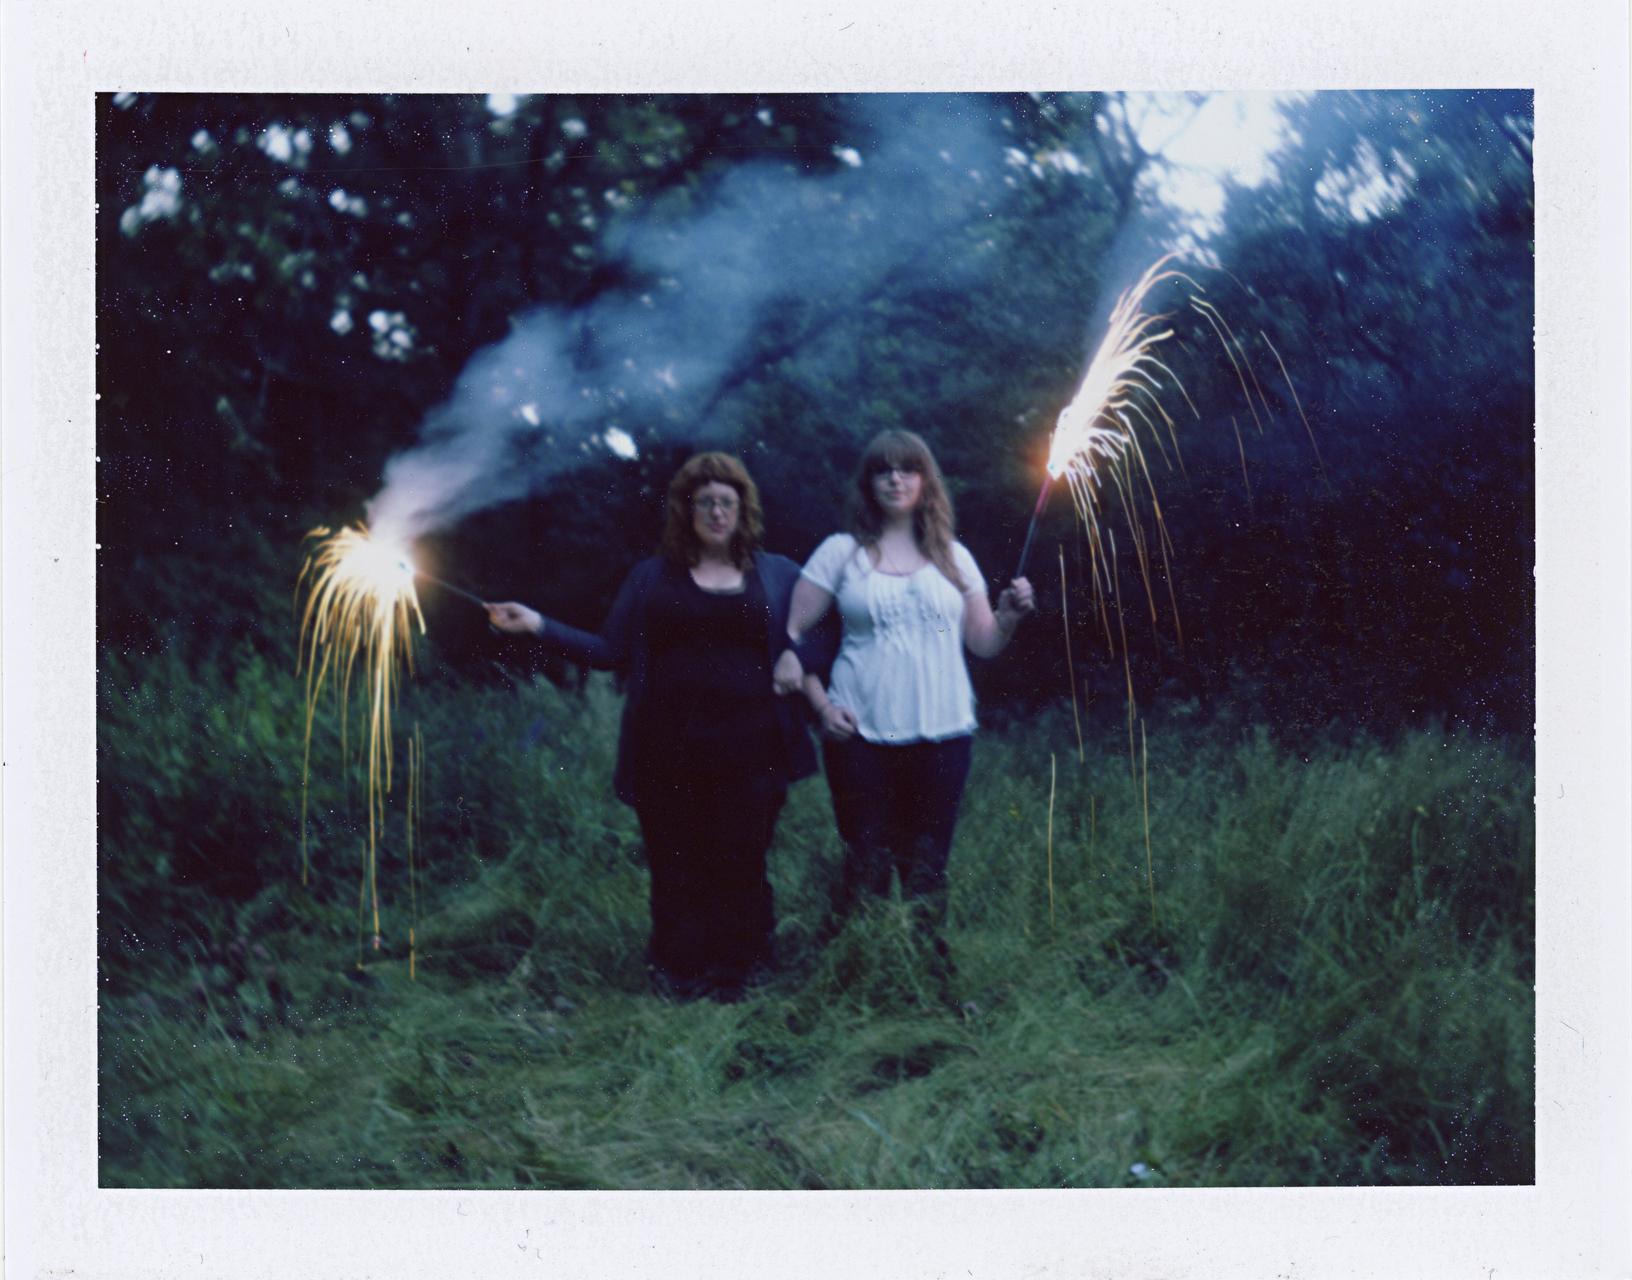 girlsfireworks.jpg